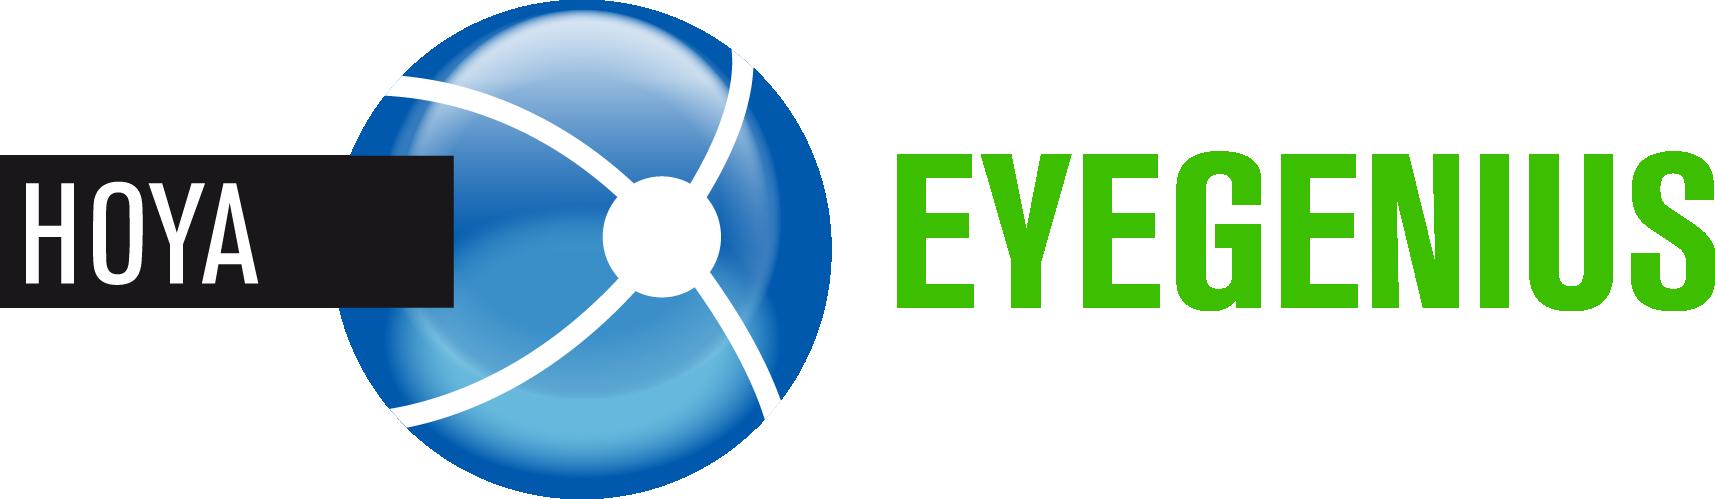 hoya-eyegenius-rgb